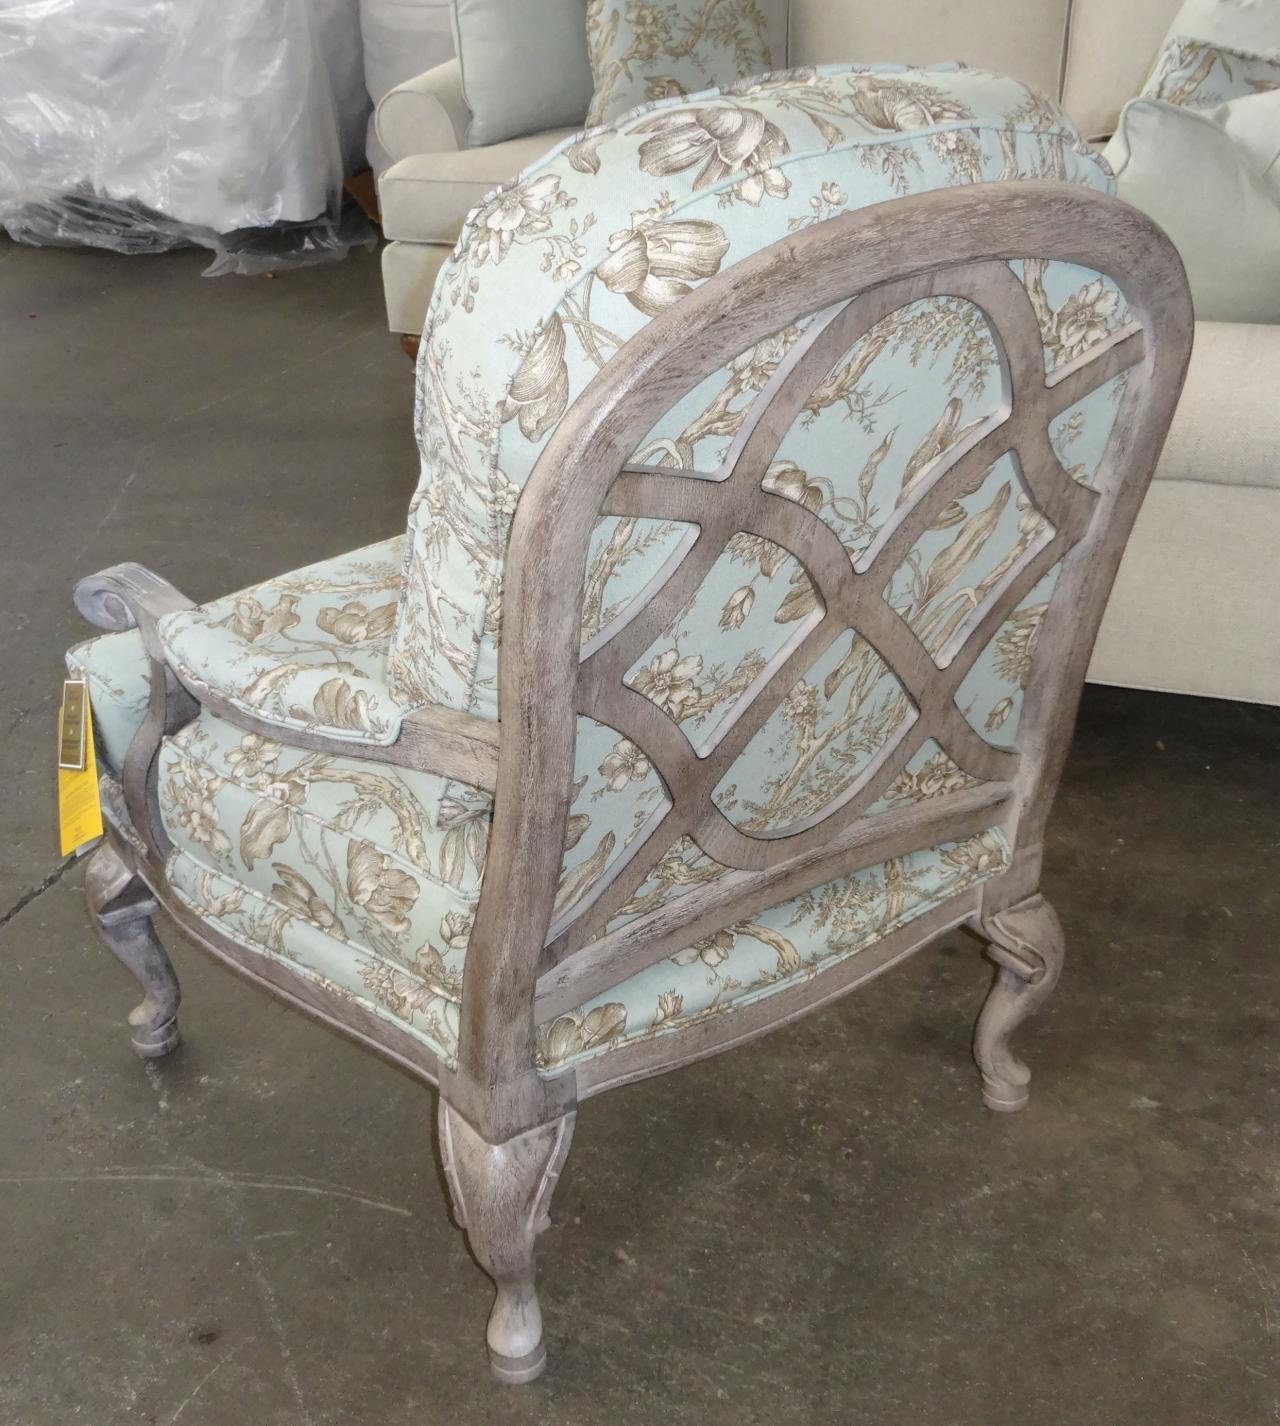 Barnett Furniture Best home furnishingsCogan